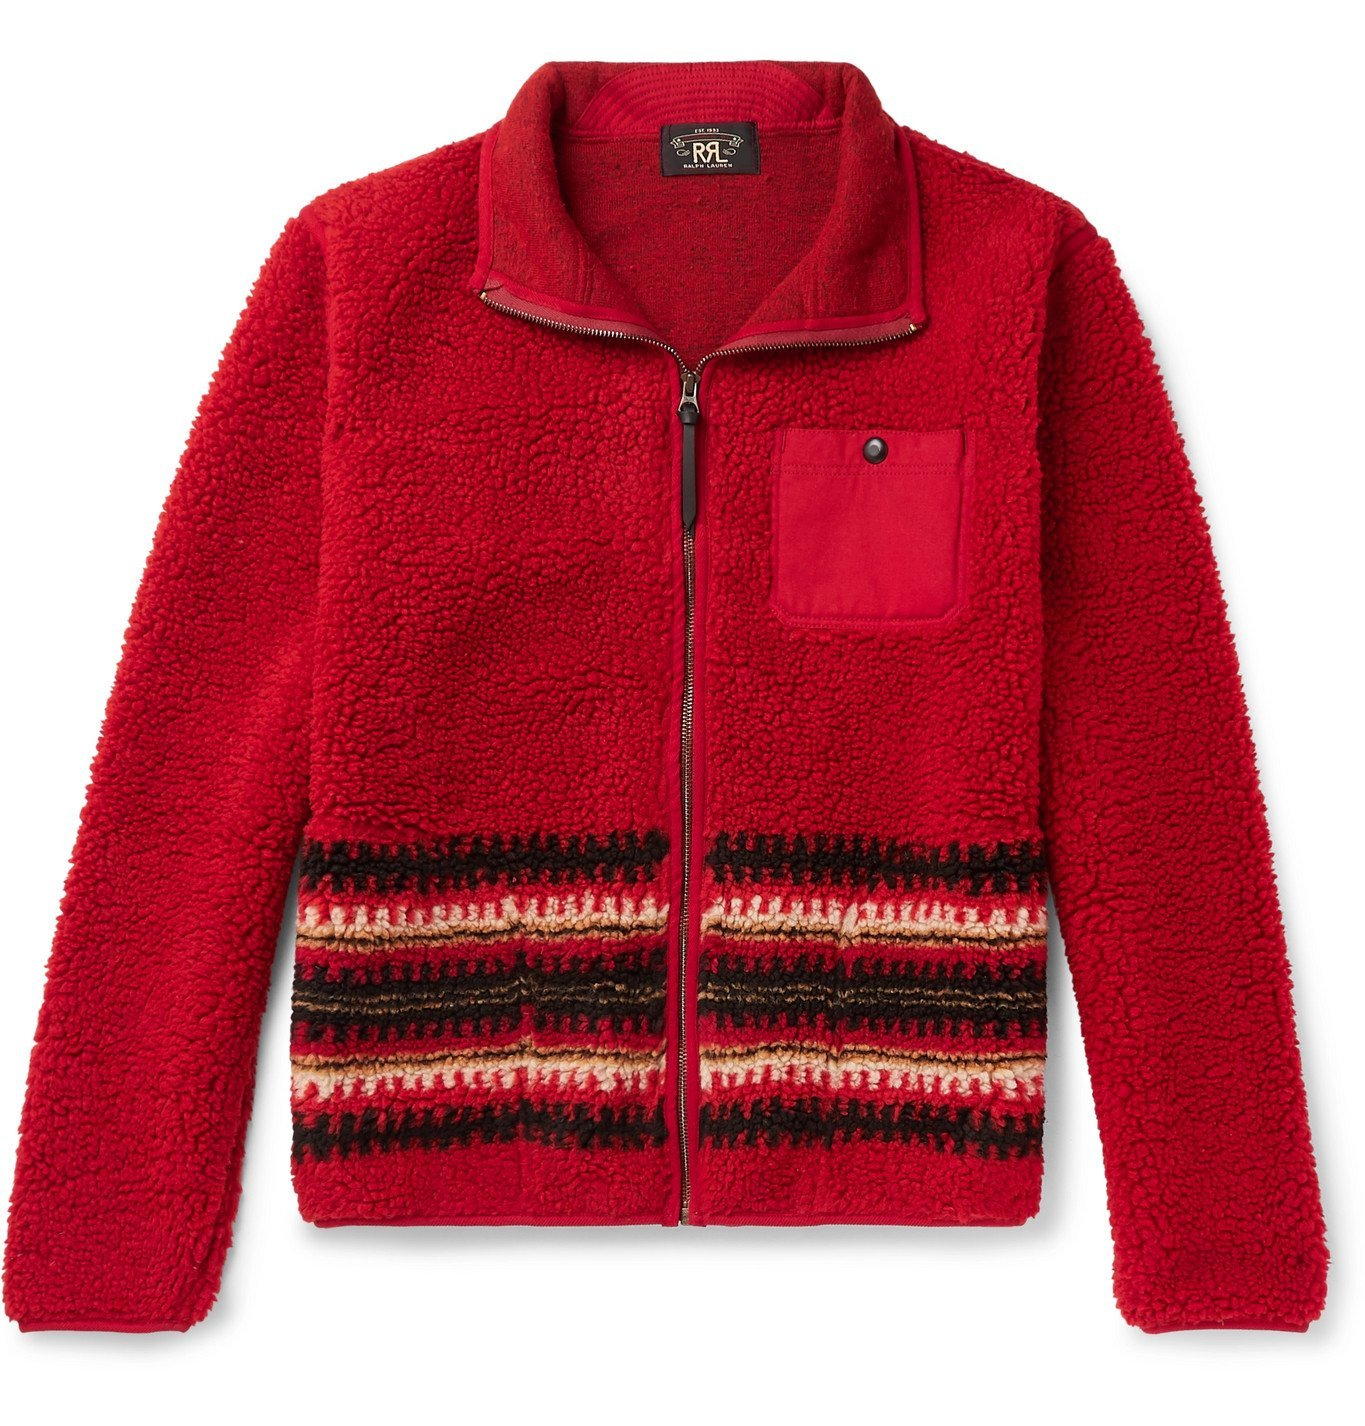 RRL - Canvas-Trimmed Intarsia Fleece Jacket - Red